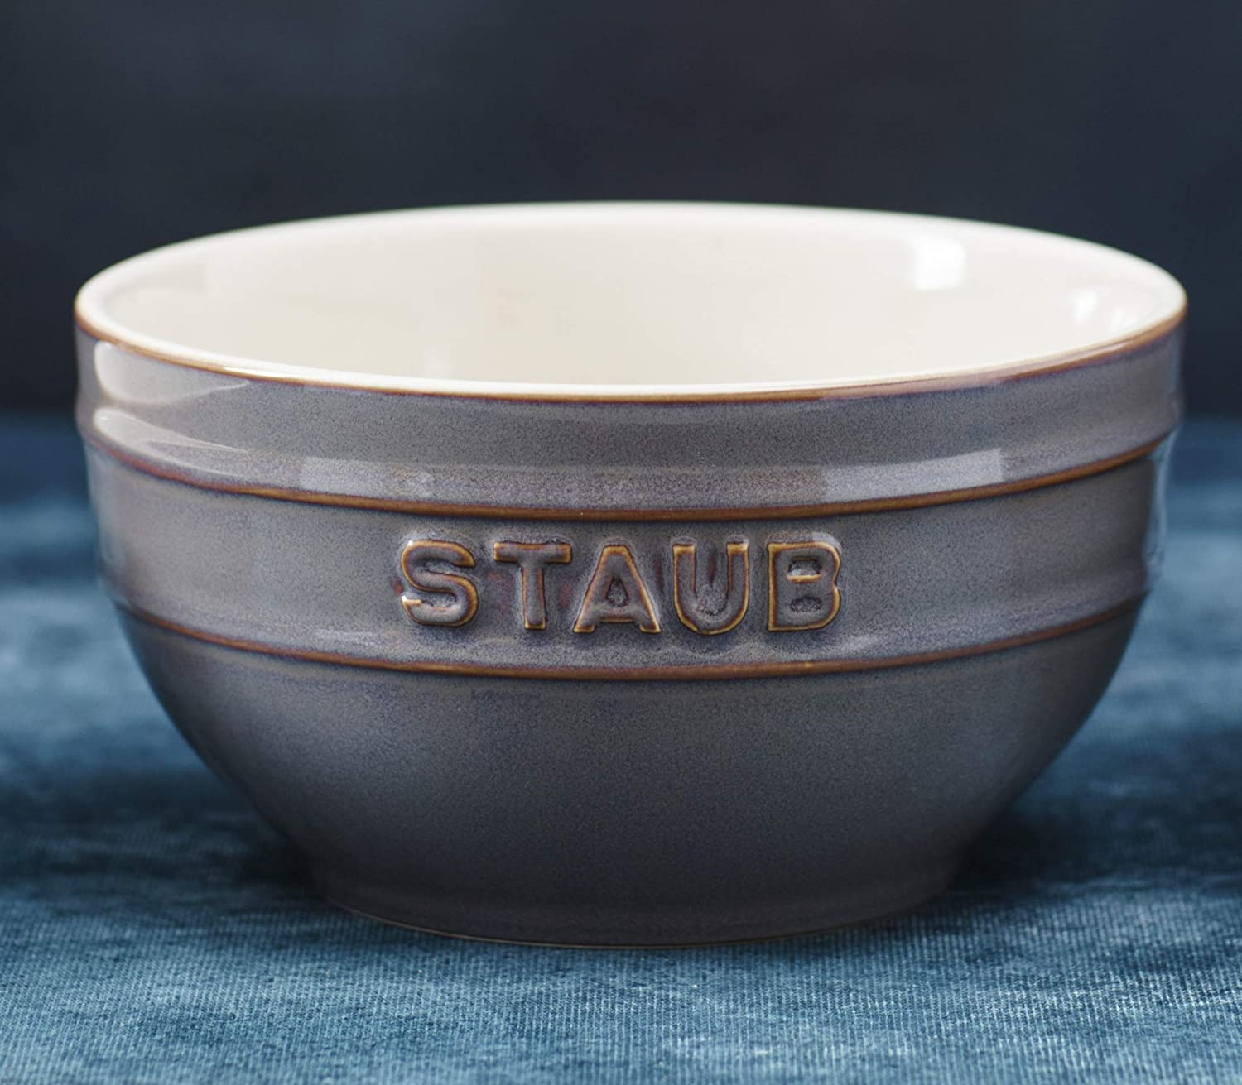 staub(ストウブ) ボウルの商品画像3